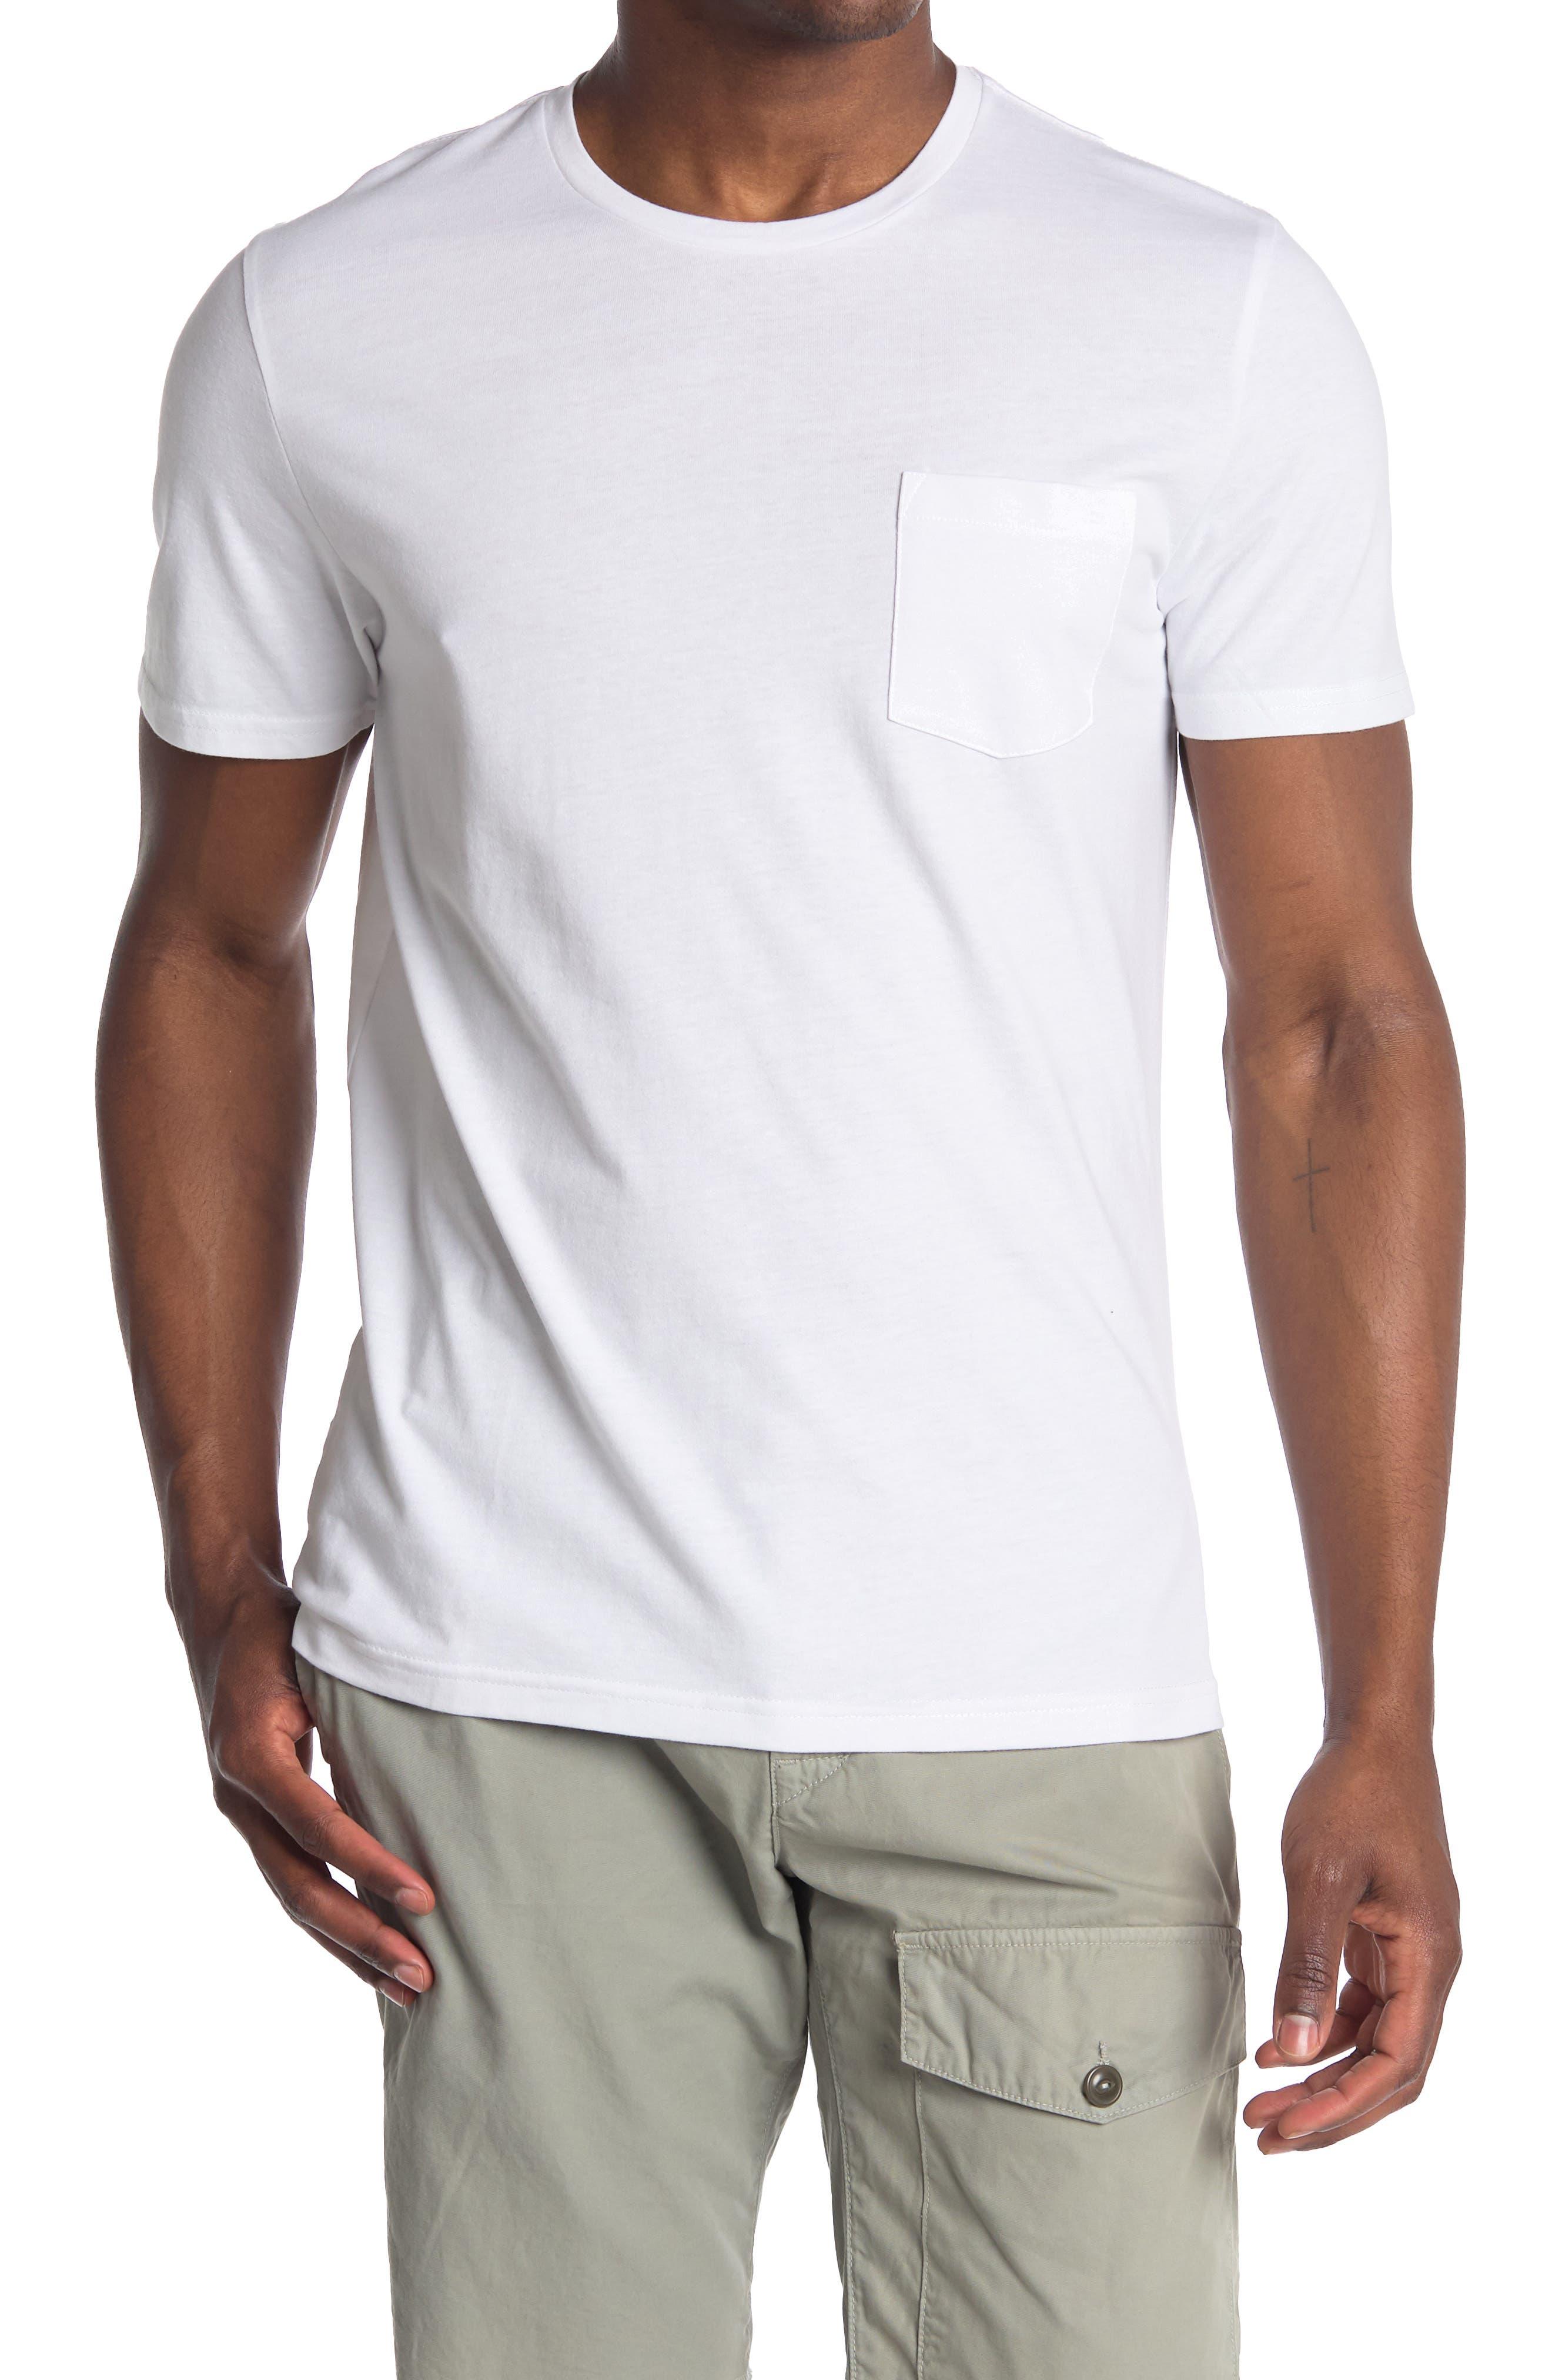 1950s Mens Shirts | Retro Bowling Shirts, Vintage Hawaiian Shirts Abound Short Sleeve Pocket Crewneck T-Shirt Size 2XL - White at Nordstrom Rack $9.97 AT vintagedancer.com